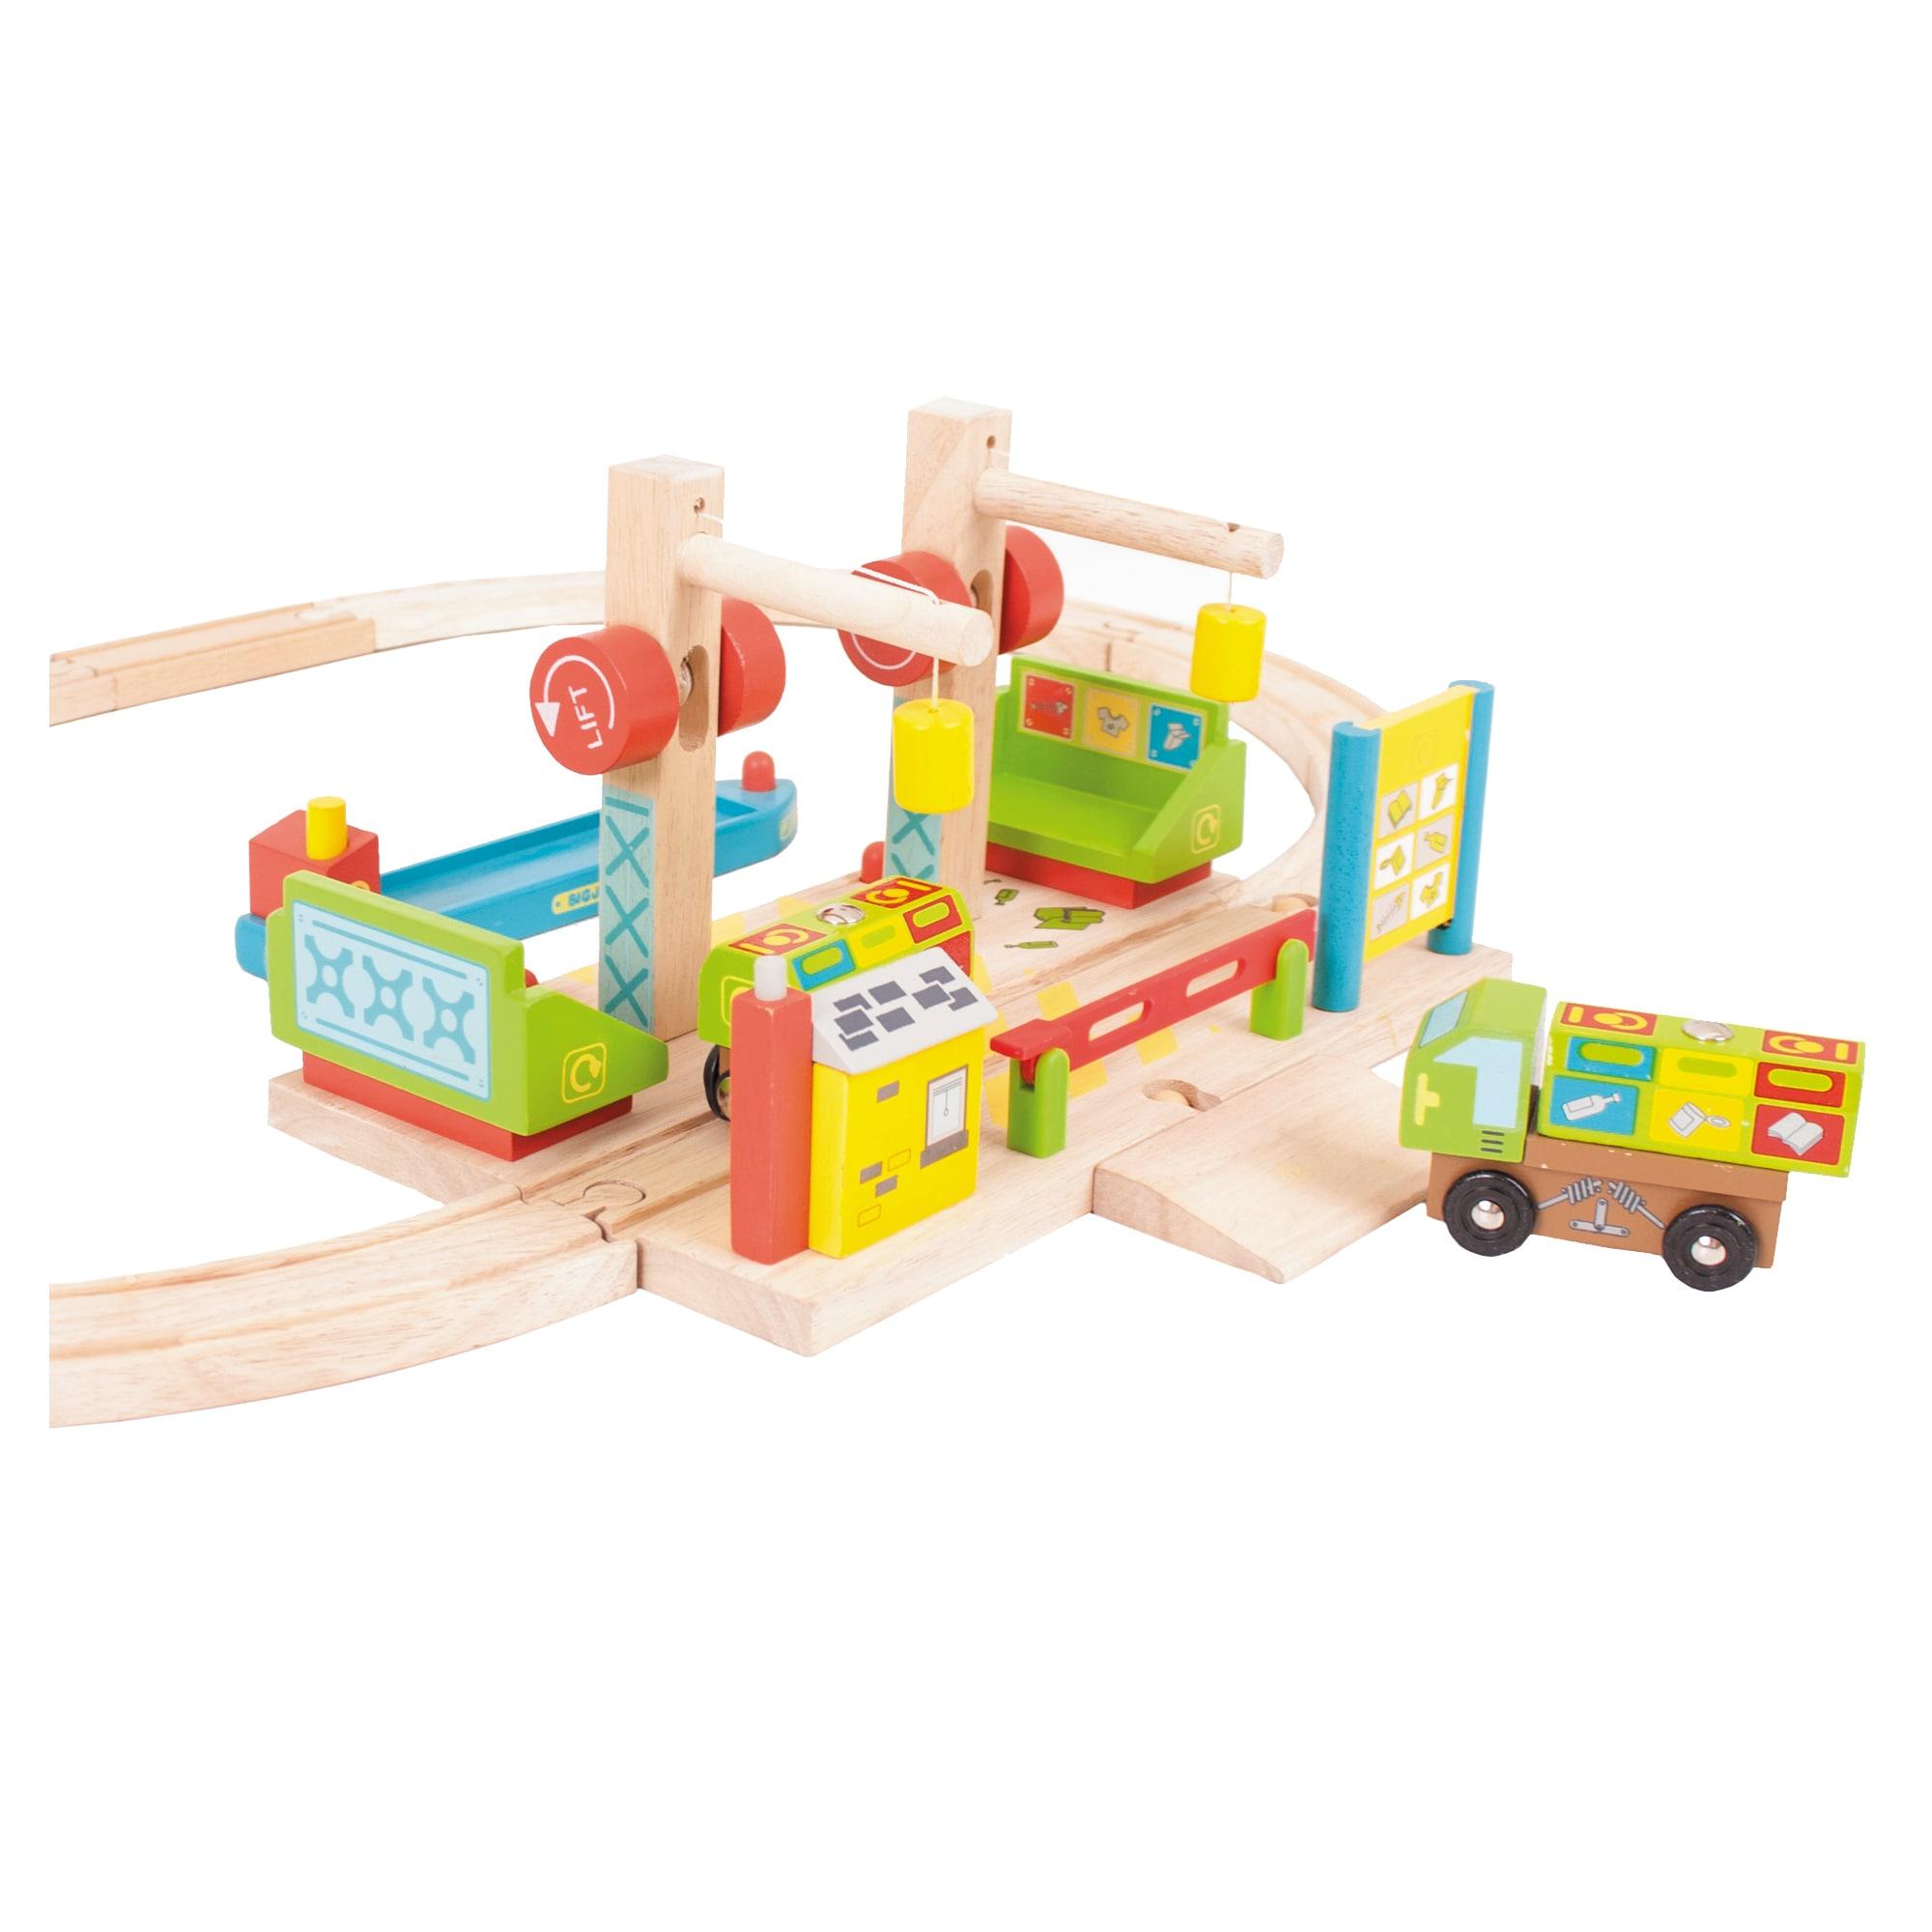 Bigjigs Dockside Recycling Center Wooden Train Accessory ...